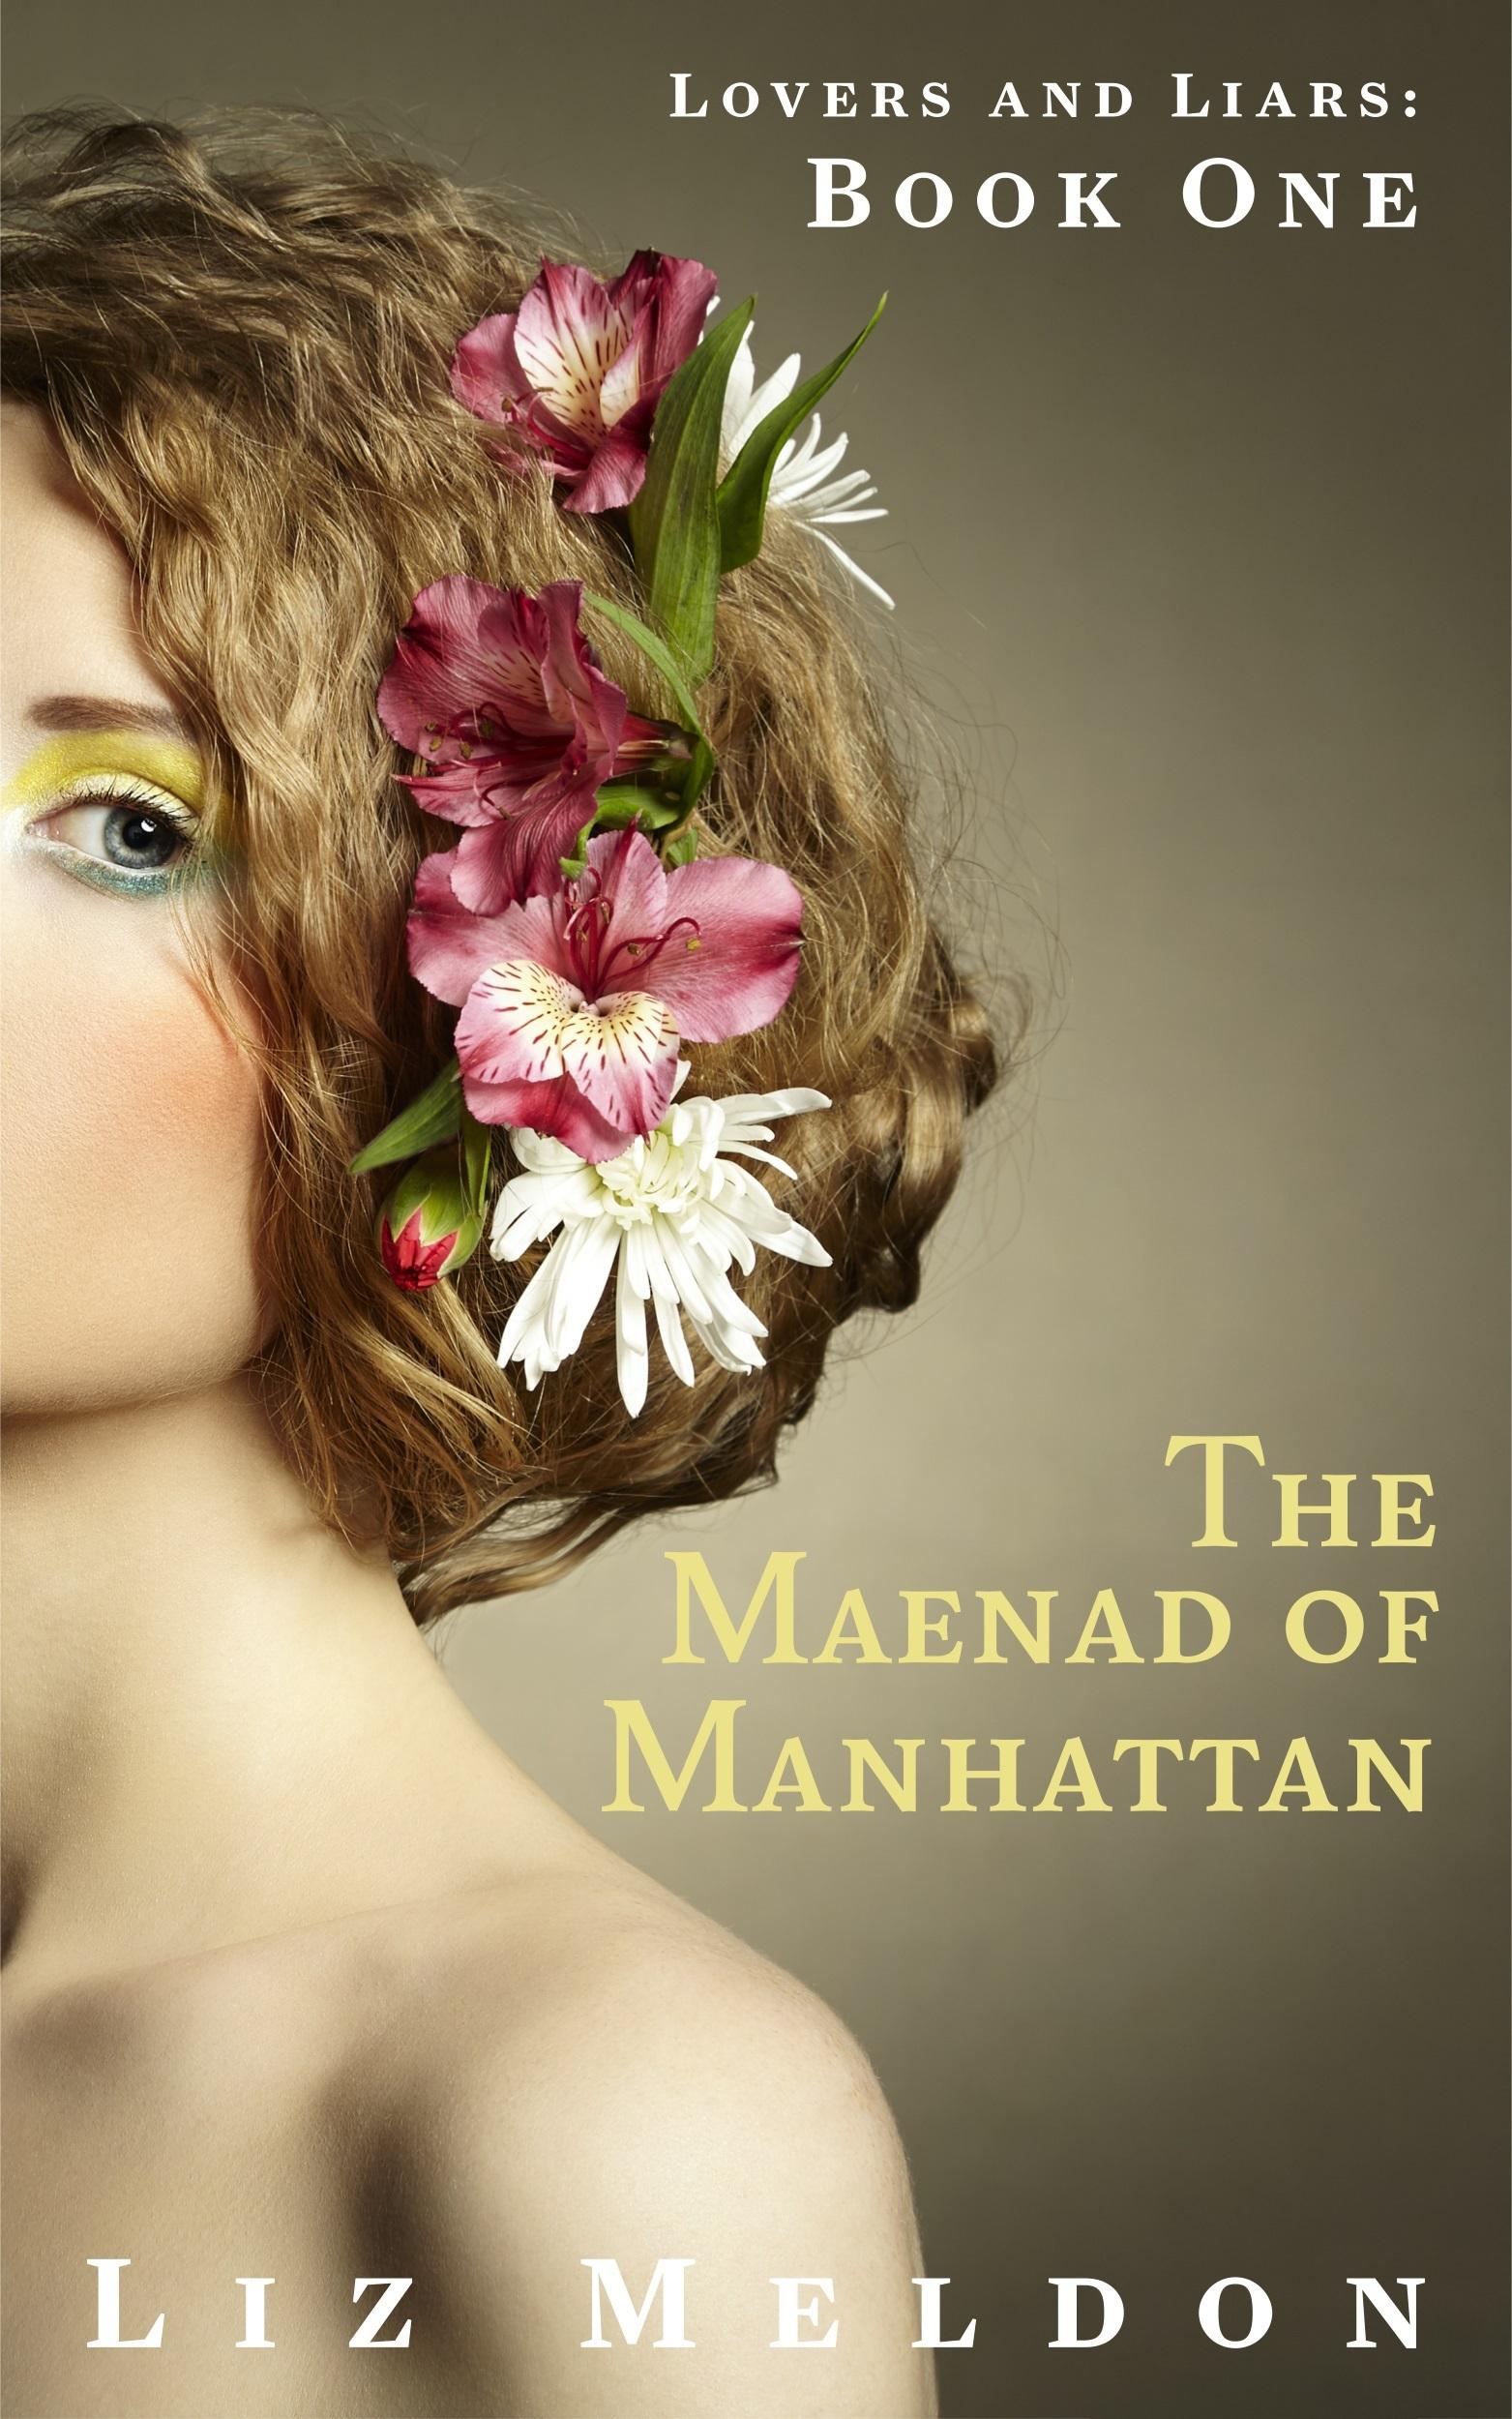 The Maenad of Manhattan Liz Meldon